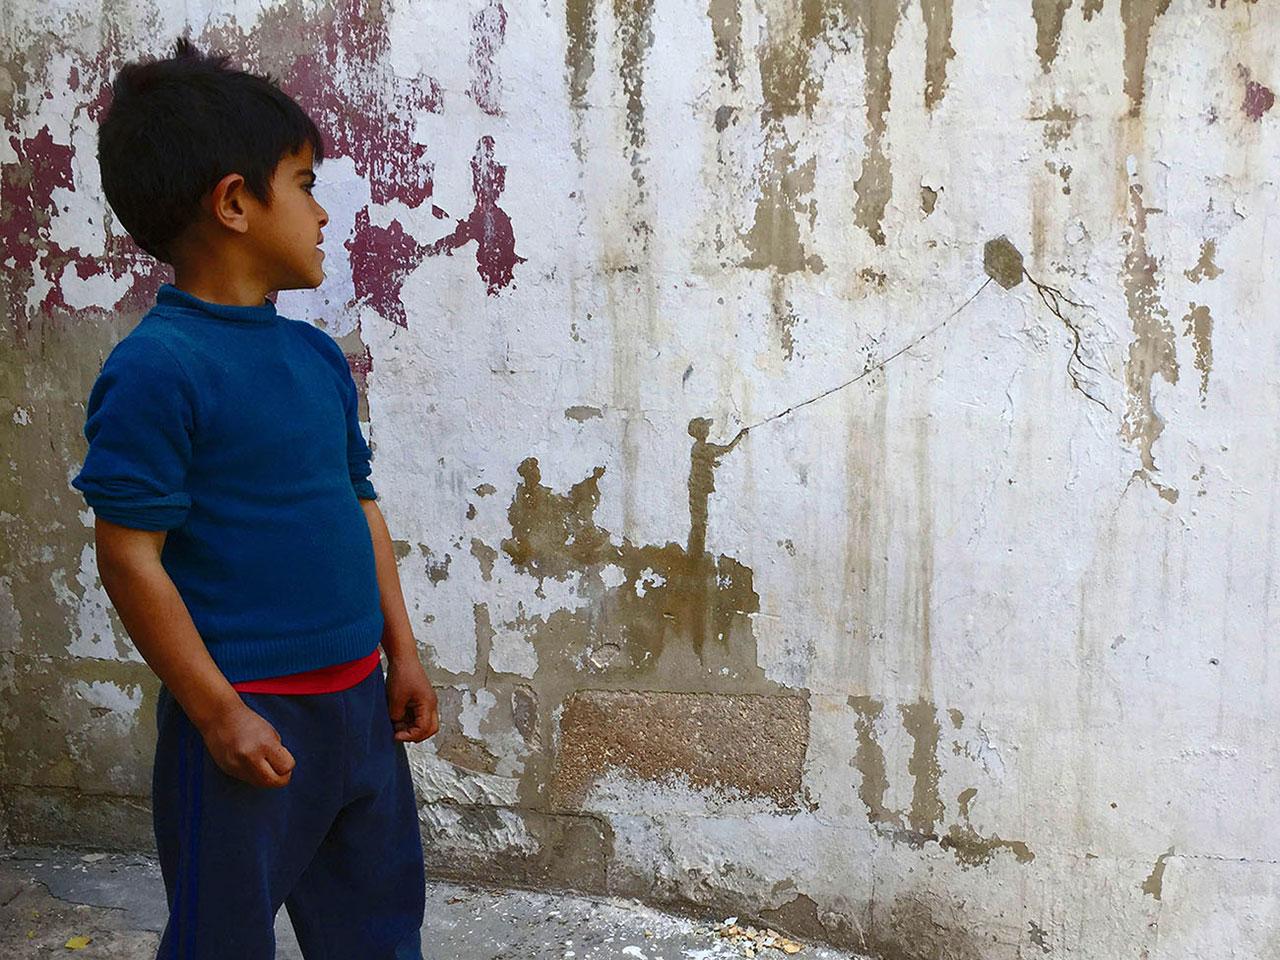 Pejac, Kite,Al-Hussein Palestinian,refugee camp, Amman, Jordan,2016.